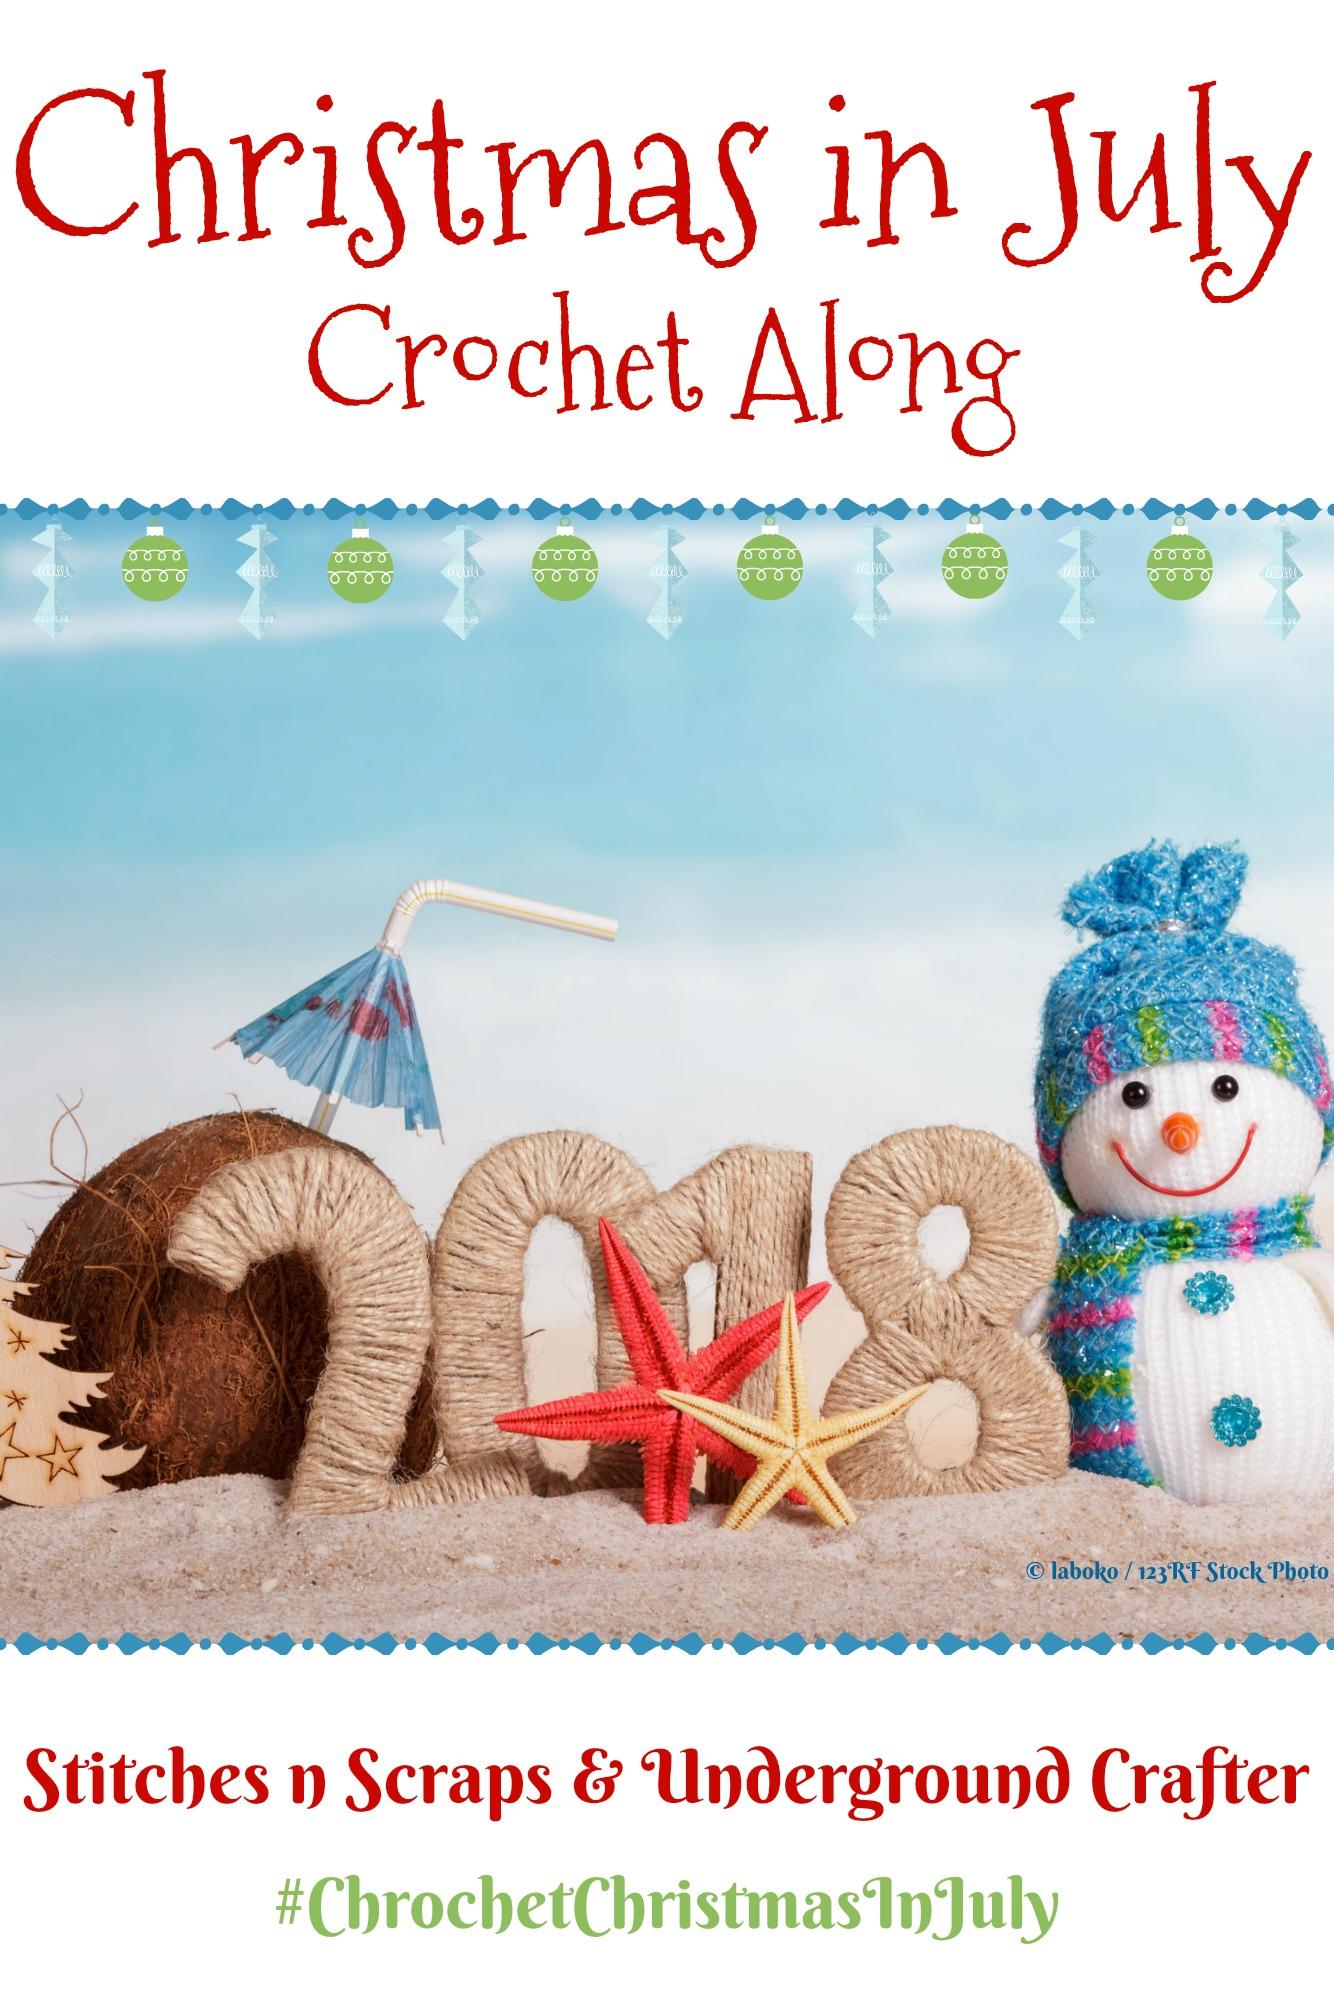 #CrochetChristmasInJuly